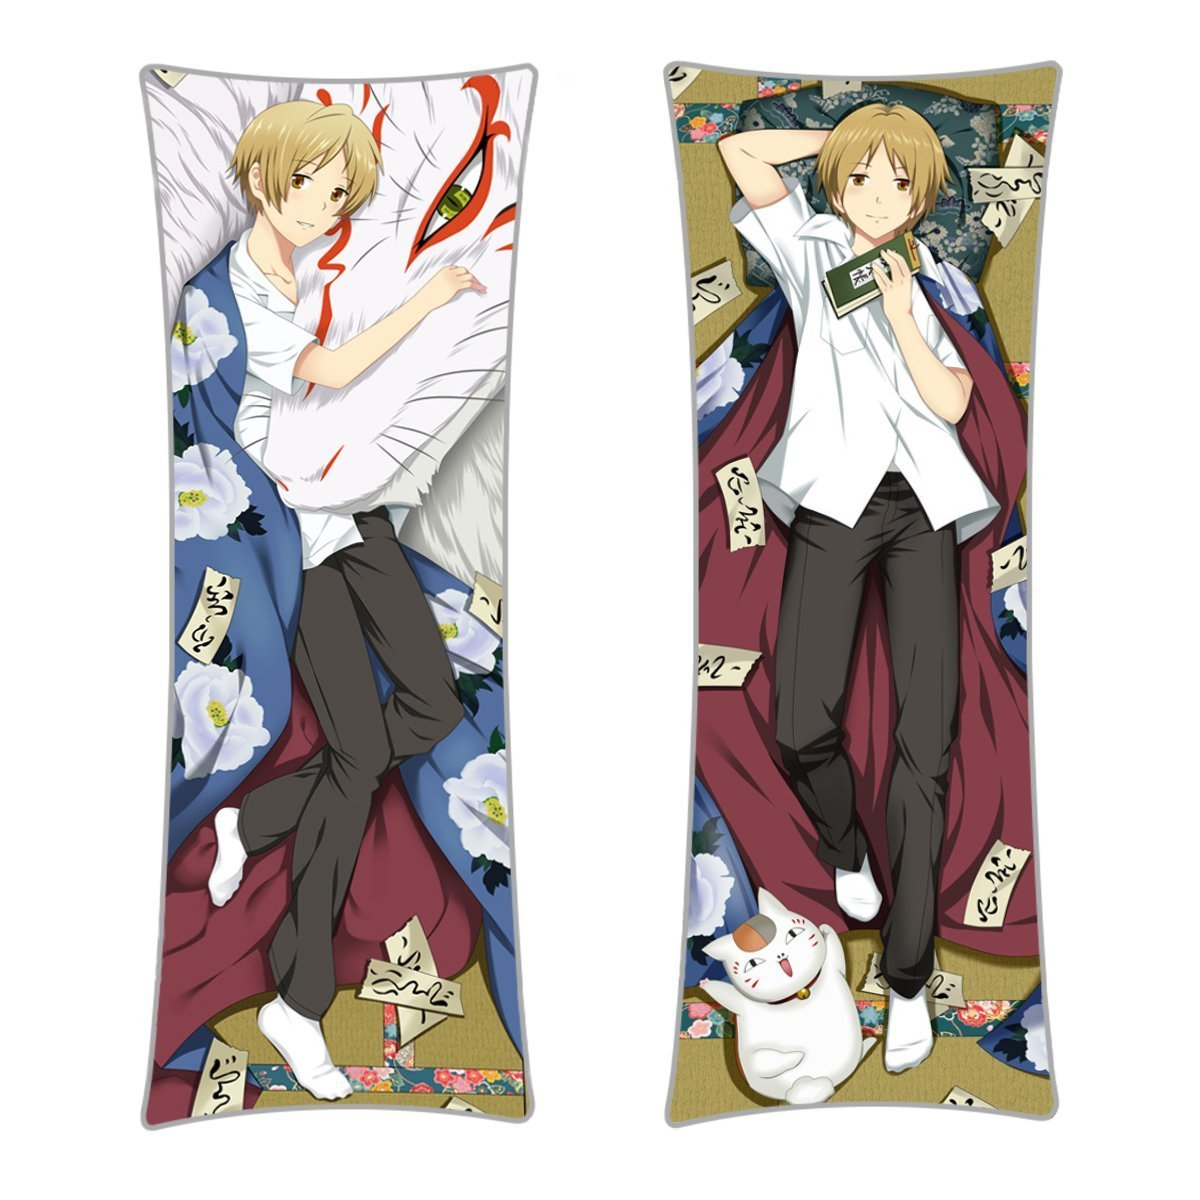 CoolChange Pakt der Yokai Umarmungskissen Natsume Takashi Bezug & Kissen, Dakimakura 150x50cm